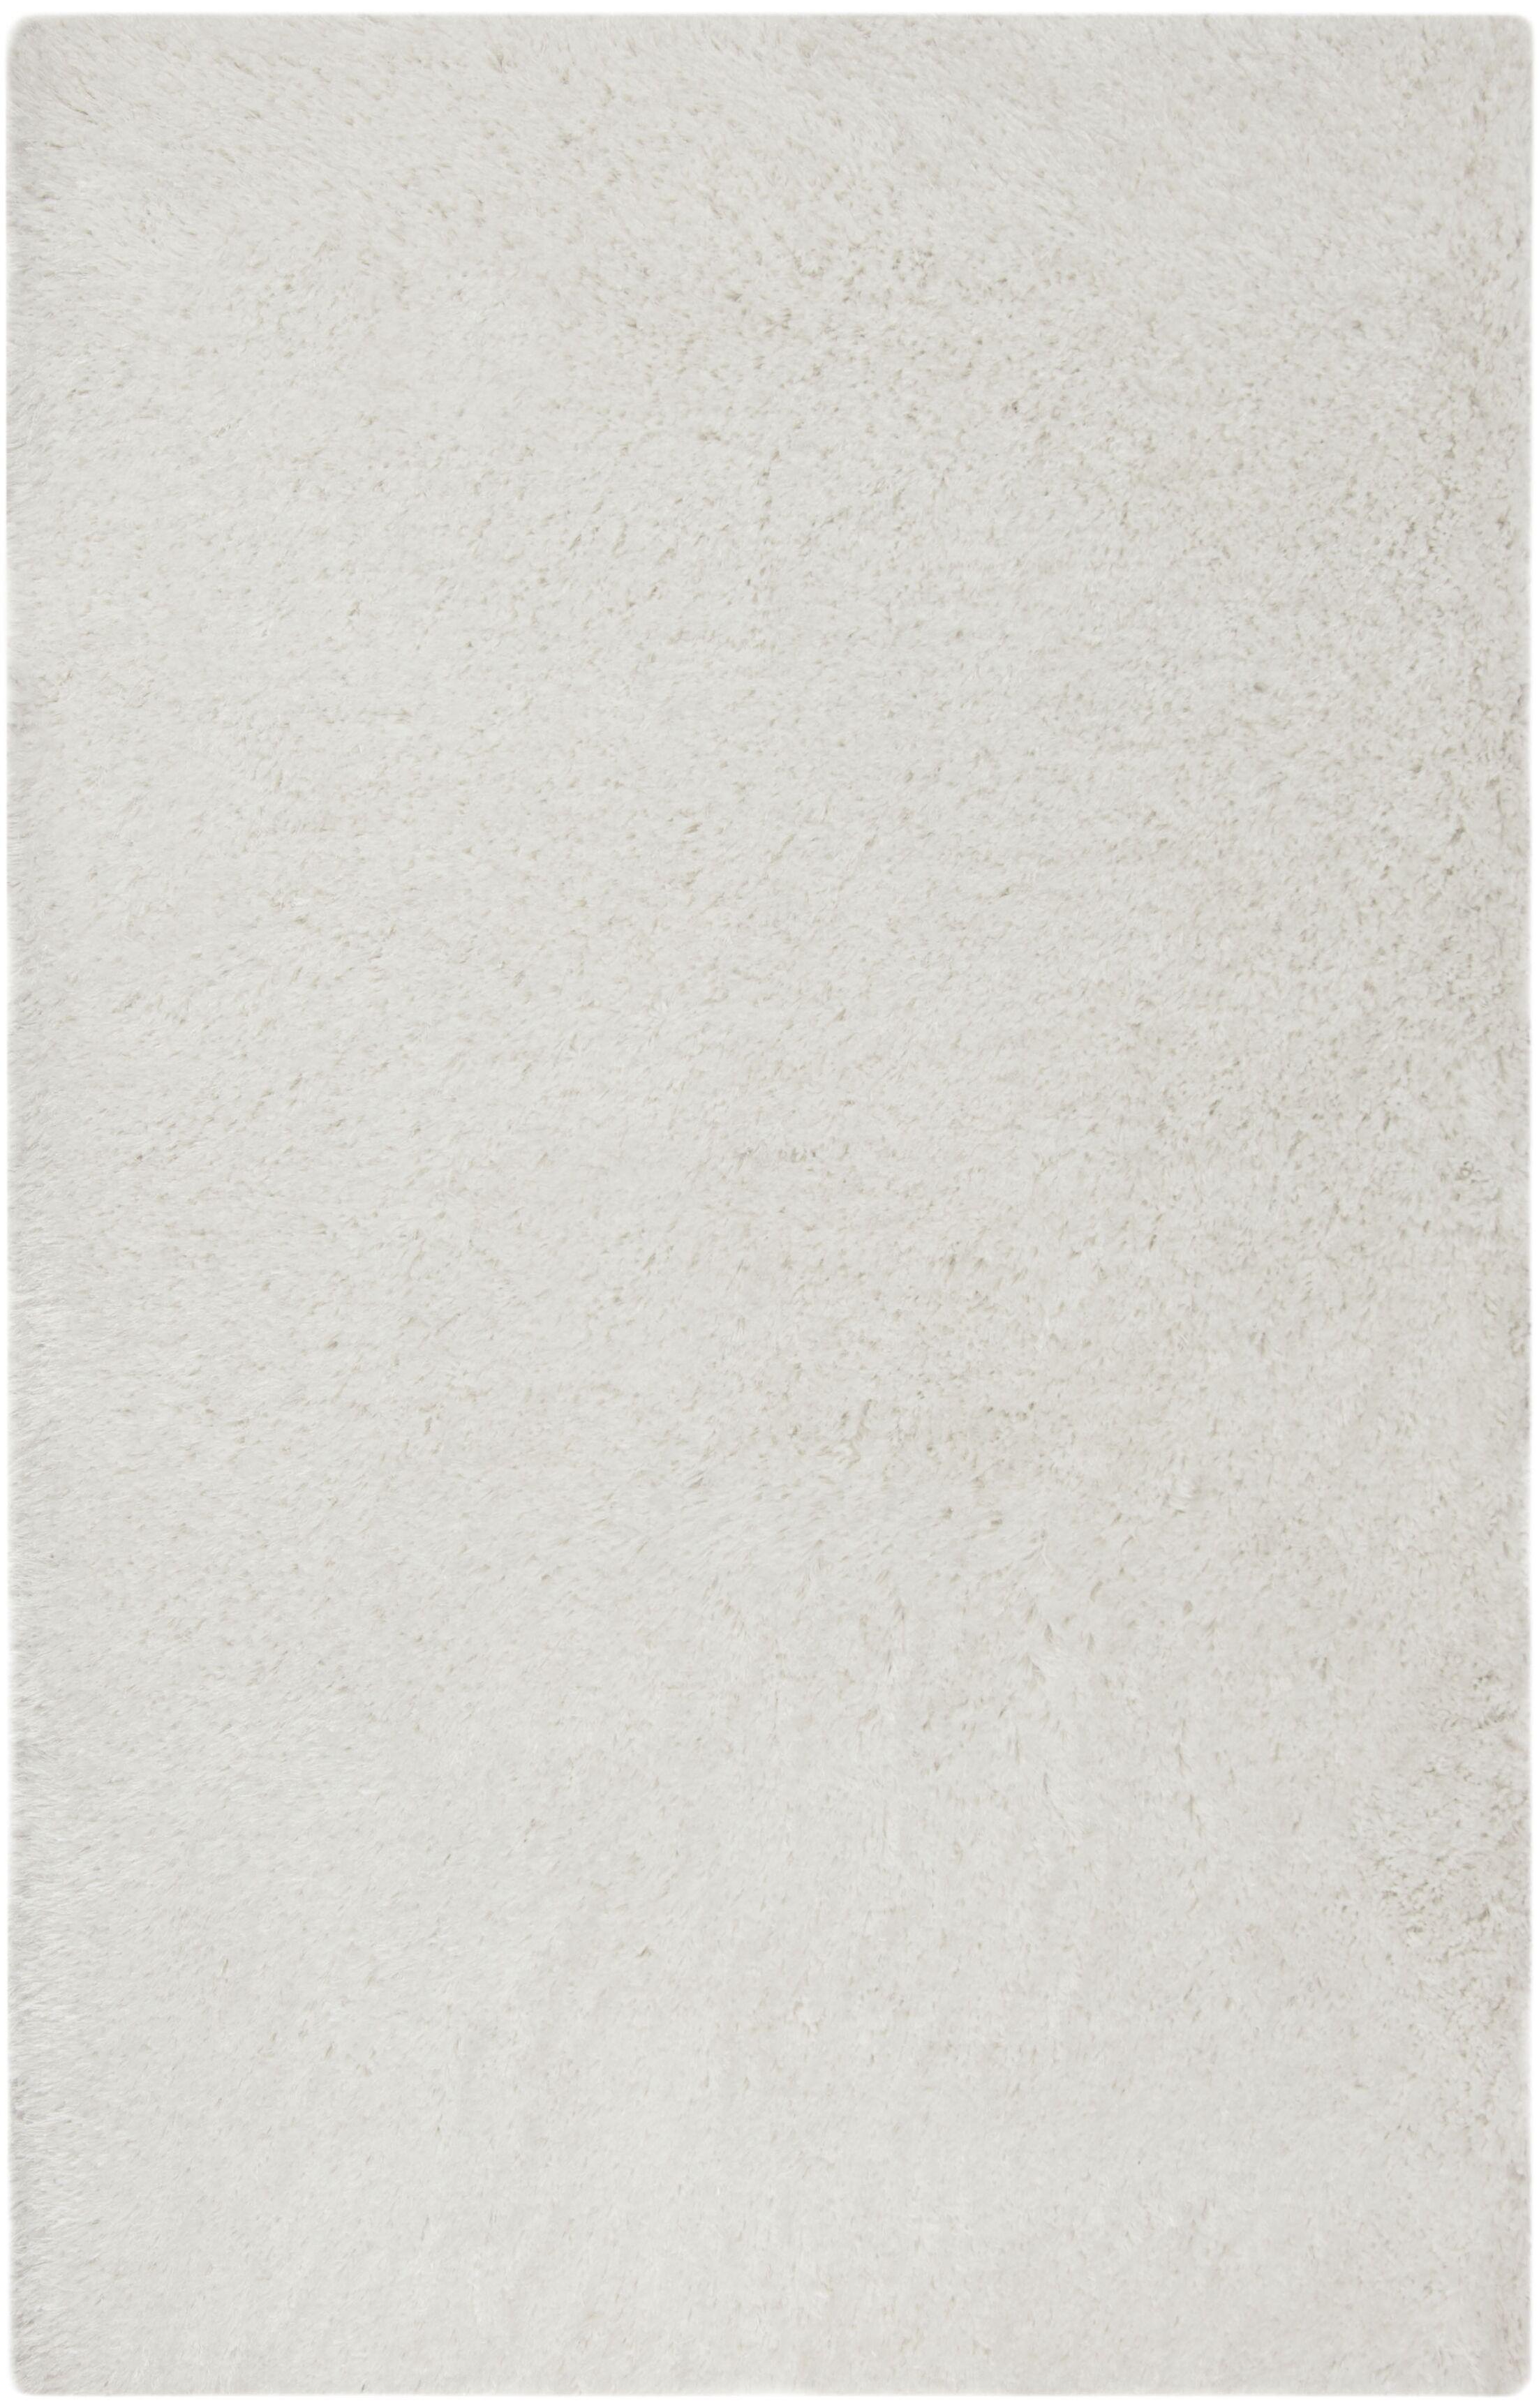 Loyola Shag Hand-Tufted Ivory Area Rug Rug Size: Rectagnle 5' x 8'